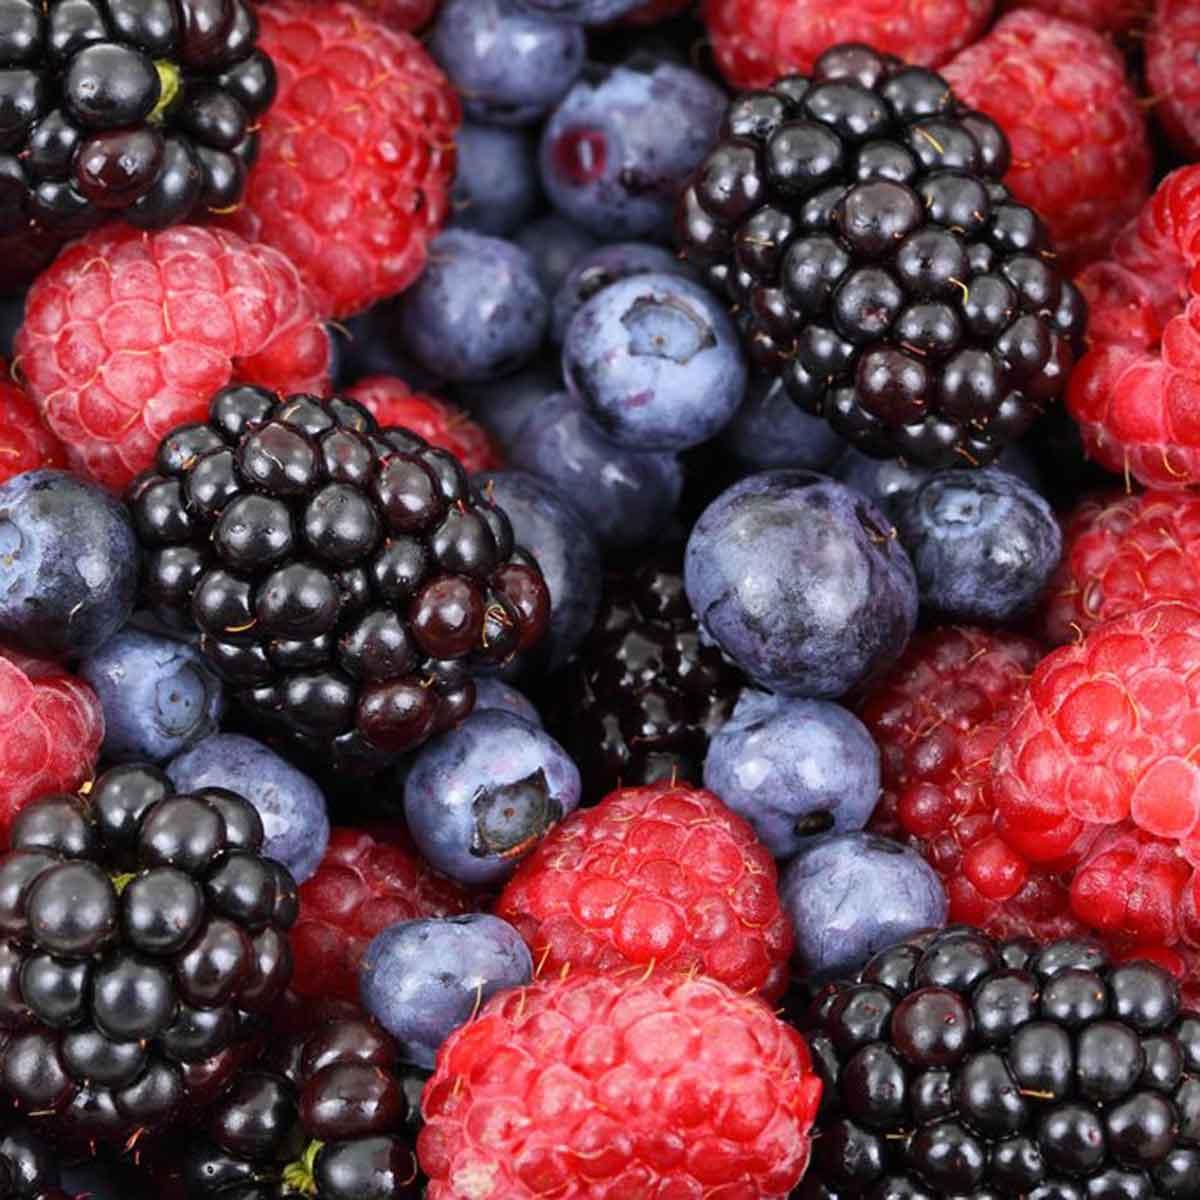 I frutti minori